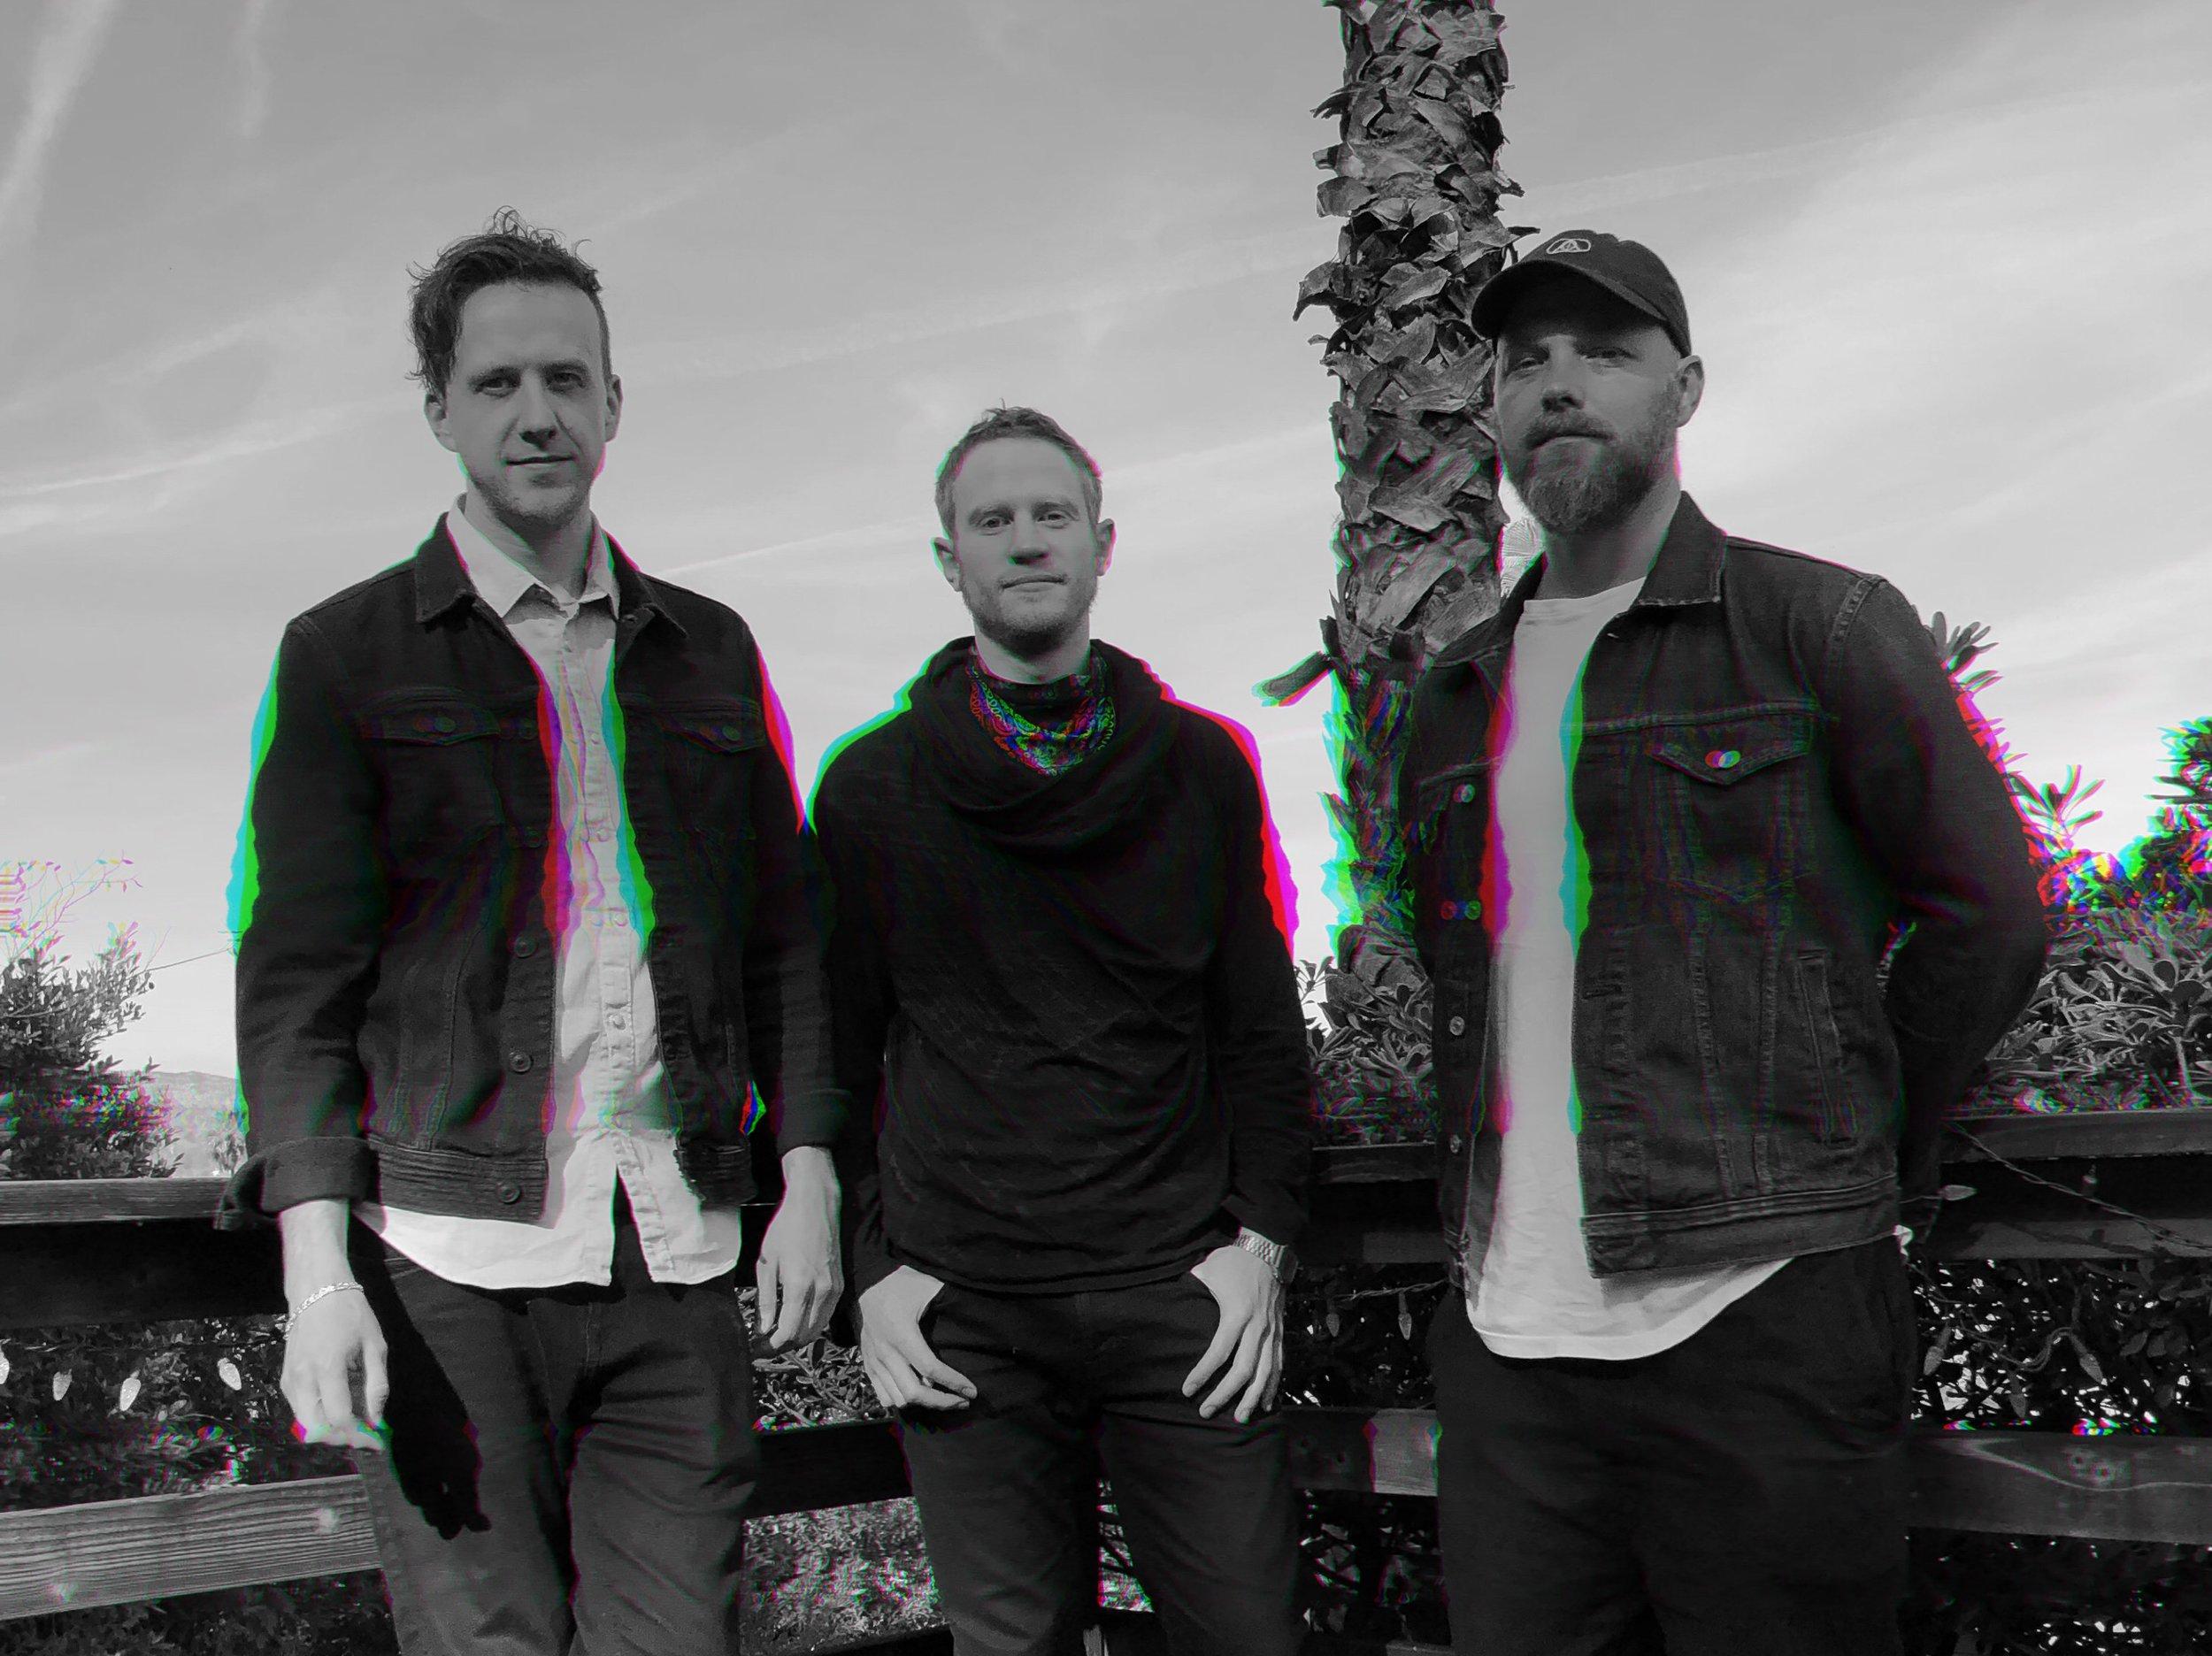 Dean, Allan and Justin